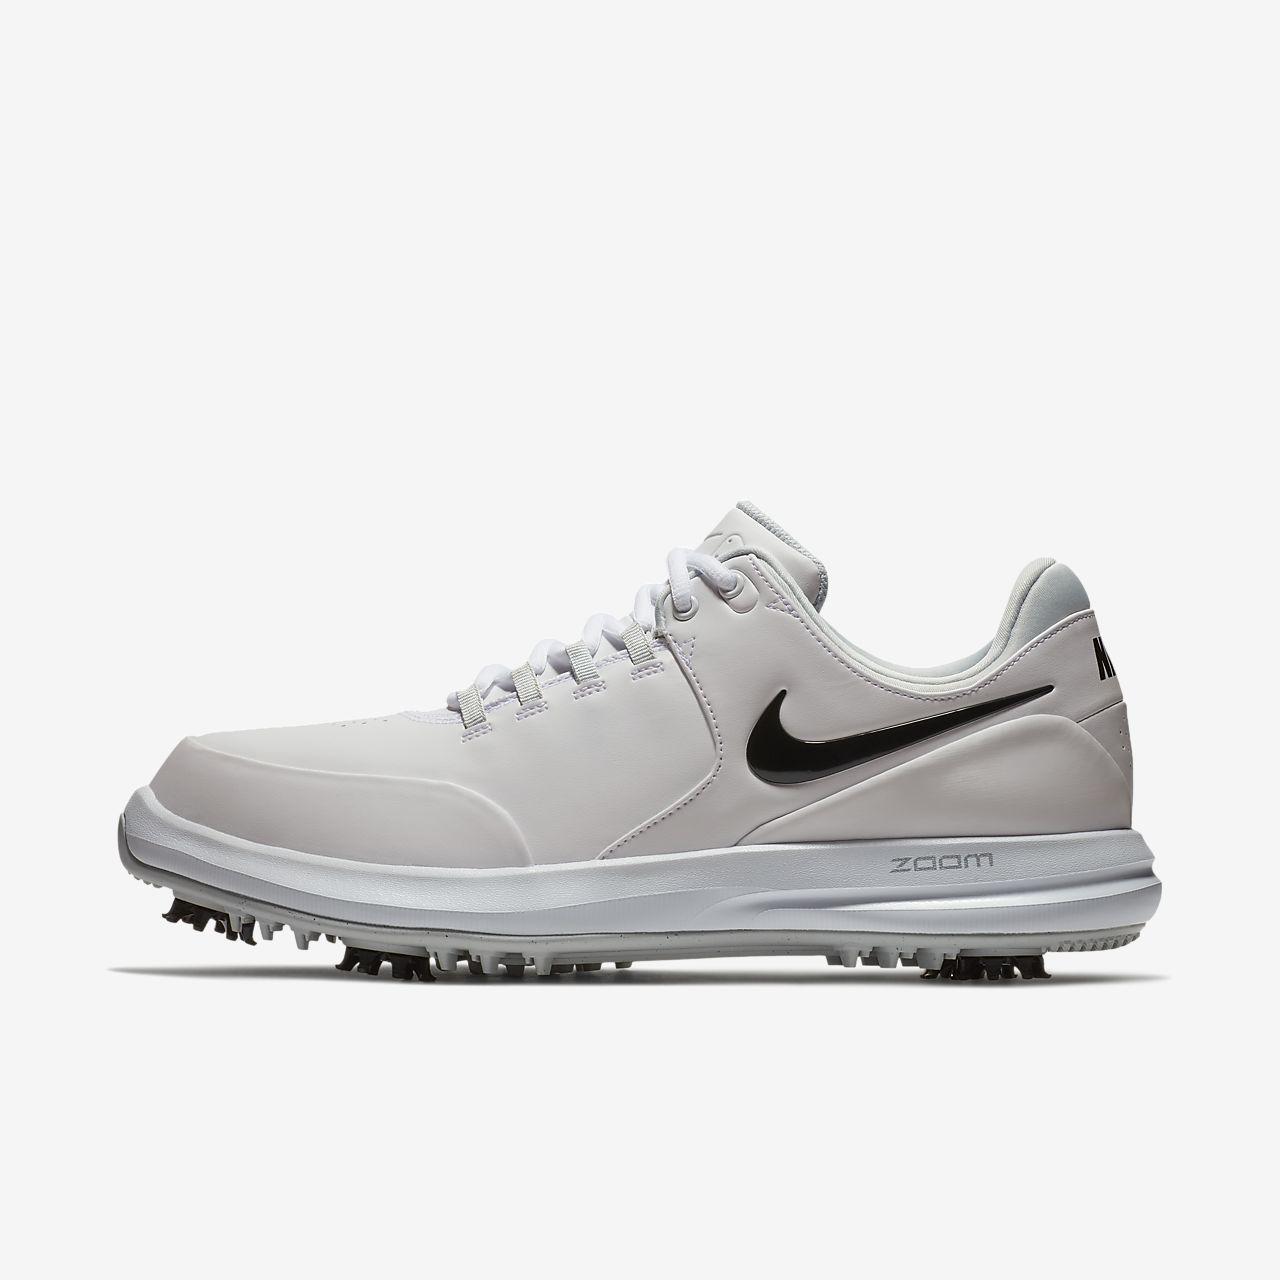 Nike Air Zoom Accurate Zapatillas de golf - Hombre. Nike.com ES 1f41083d16e